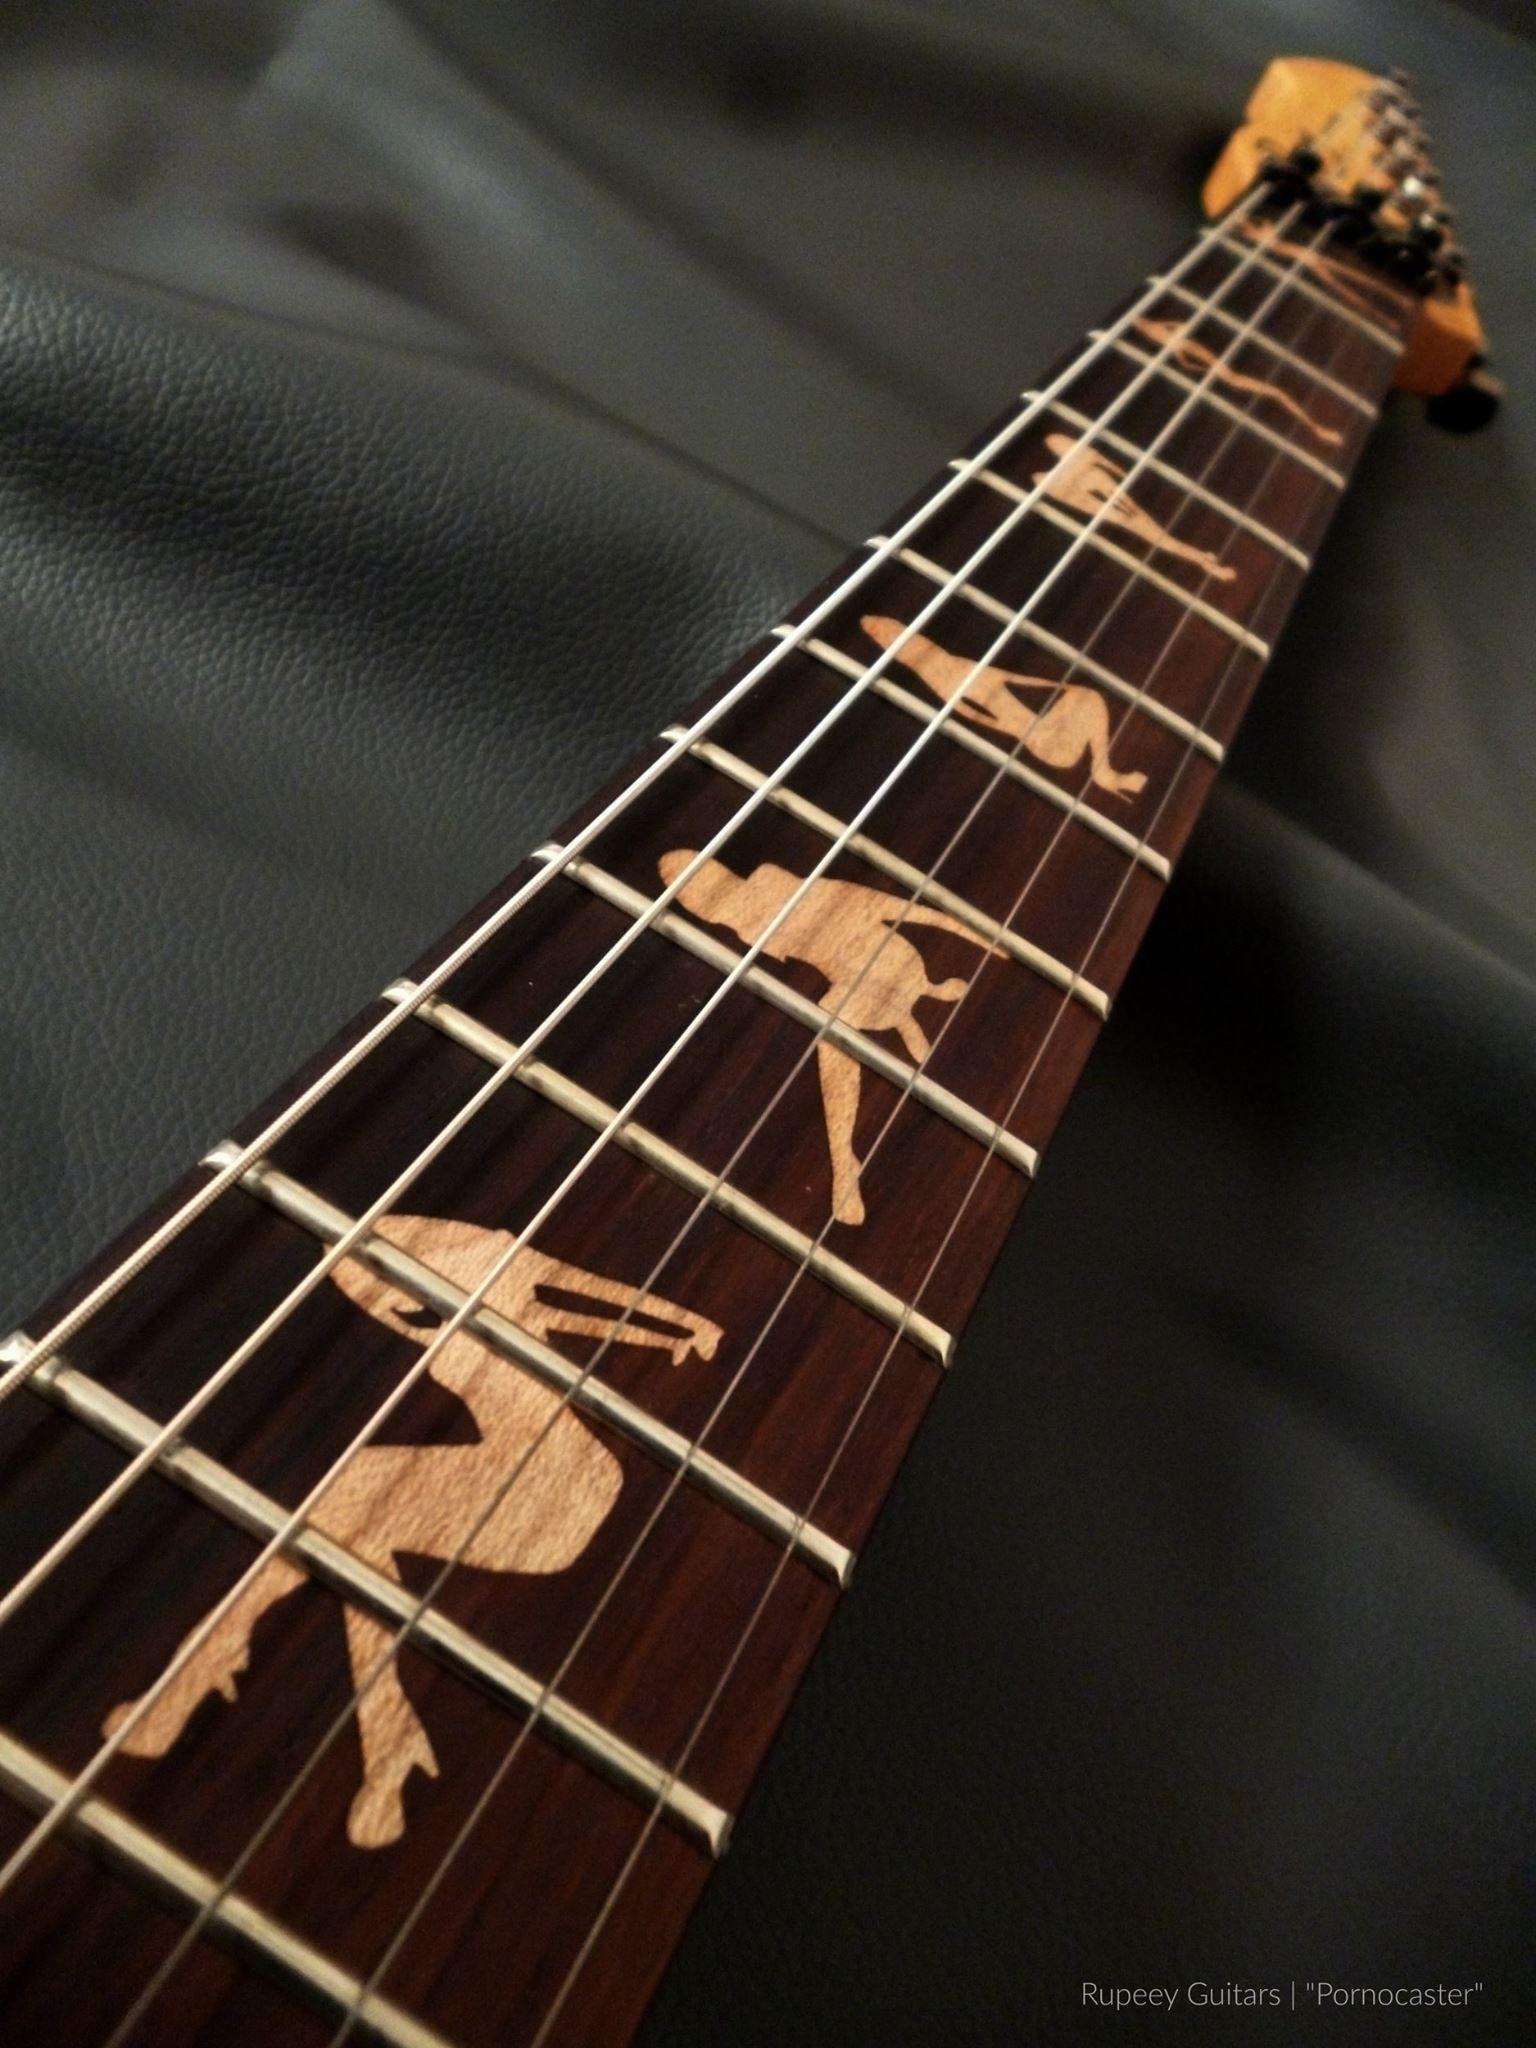 Pin By Daniel Kubitzki On Rupeey Guitar Yogyakarta Indonesia Guitar Painting Guitar Fretboard Bass Music